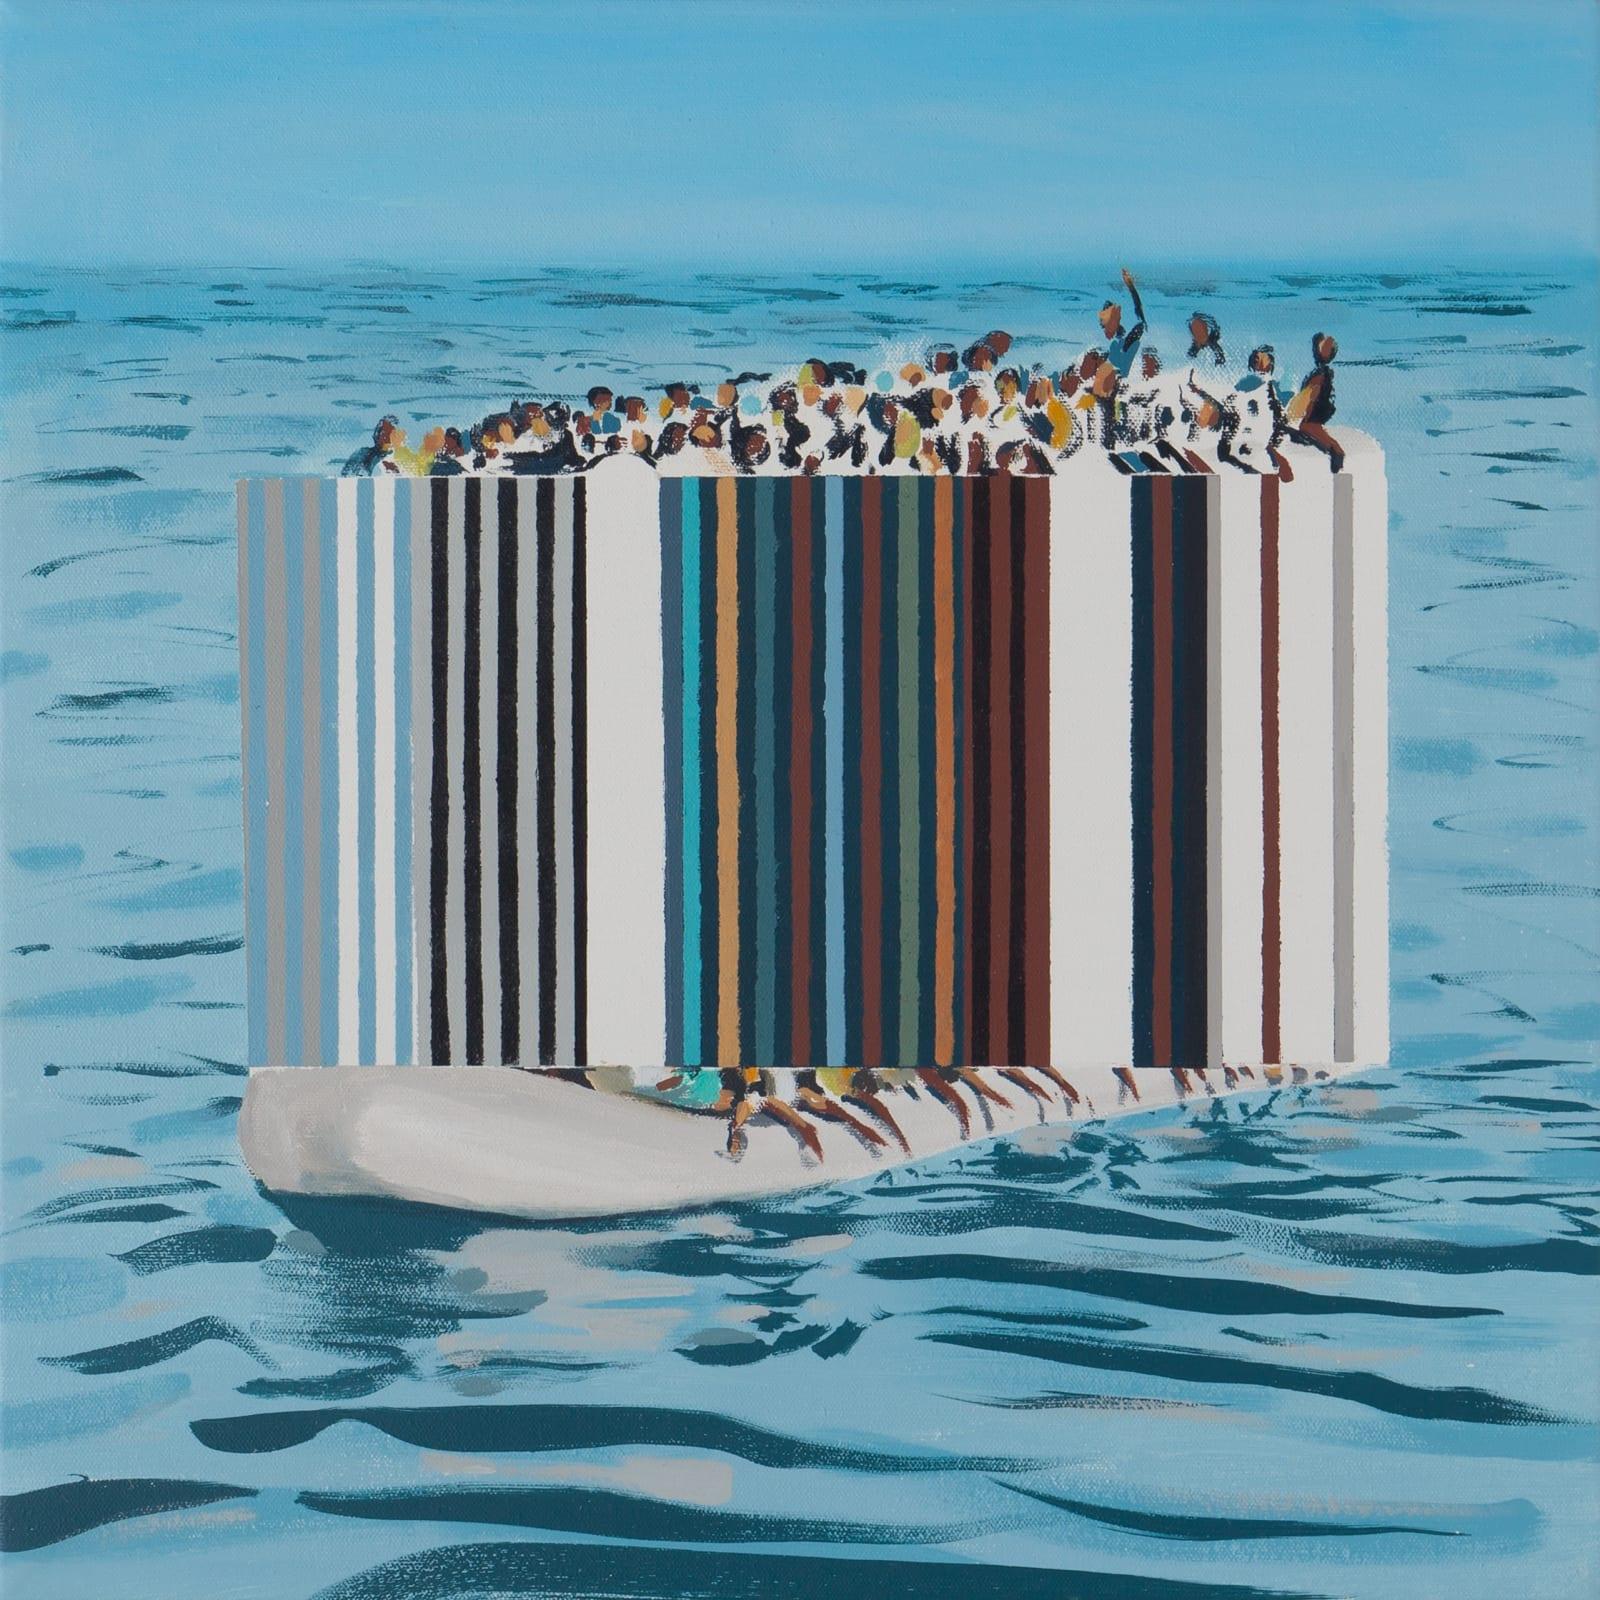 Opening: Against the Tide, Darren Coffield